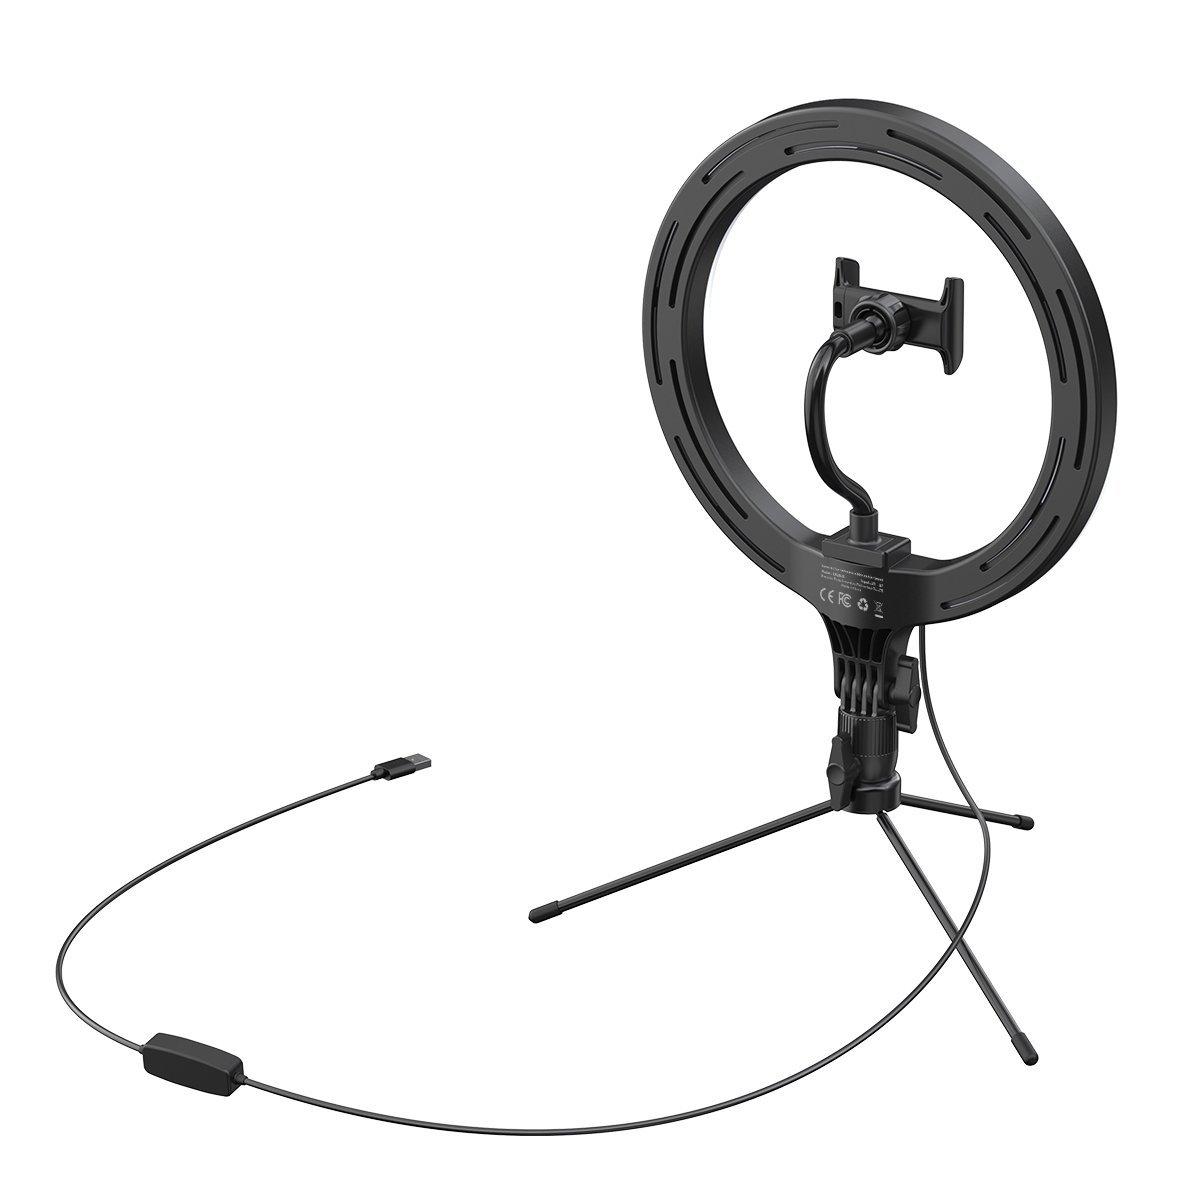 Baseus Live Stream Holder Stand 12' Black  - 3